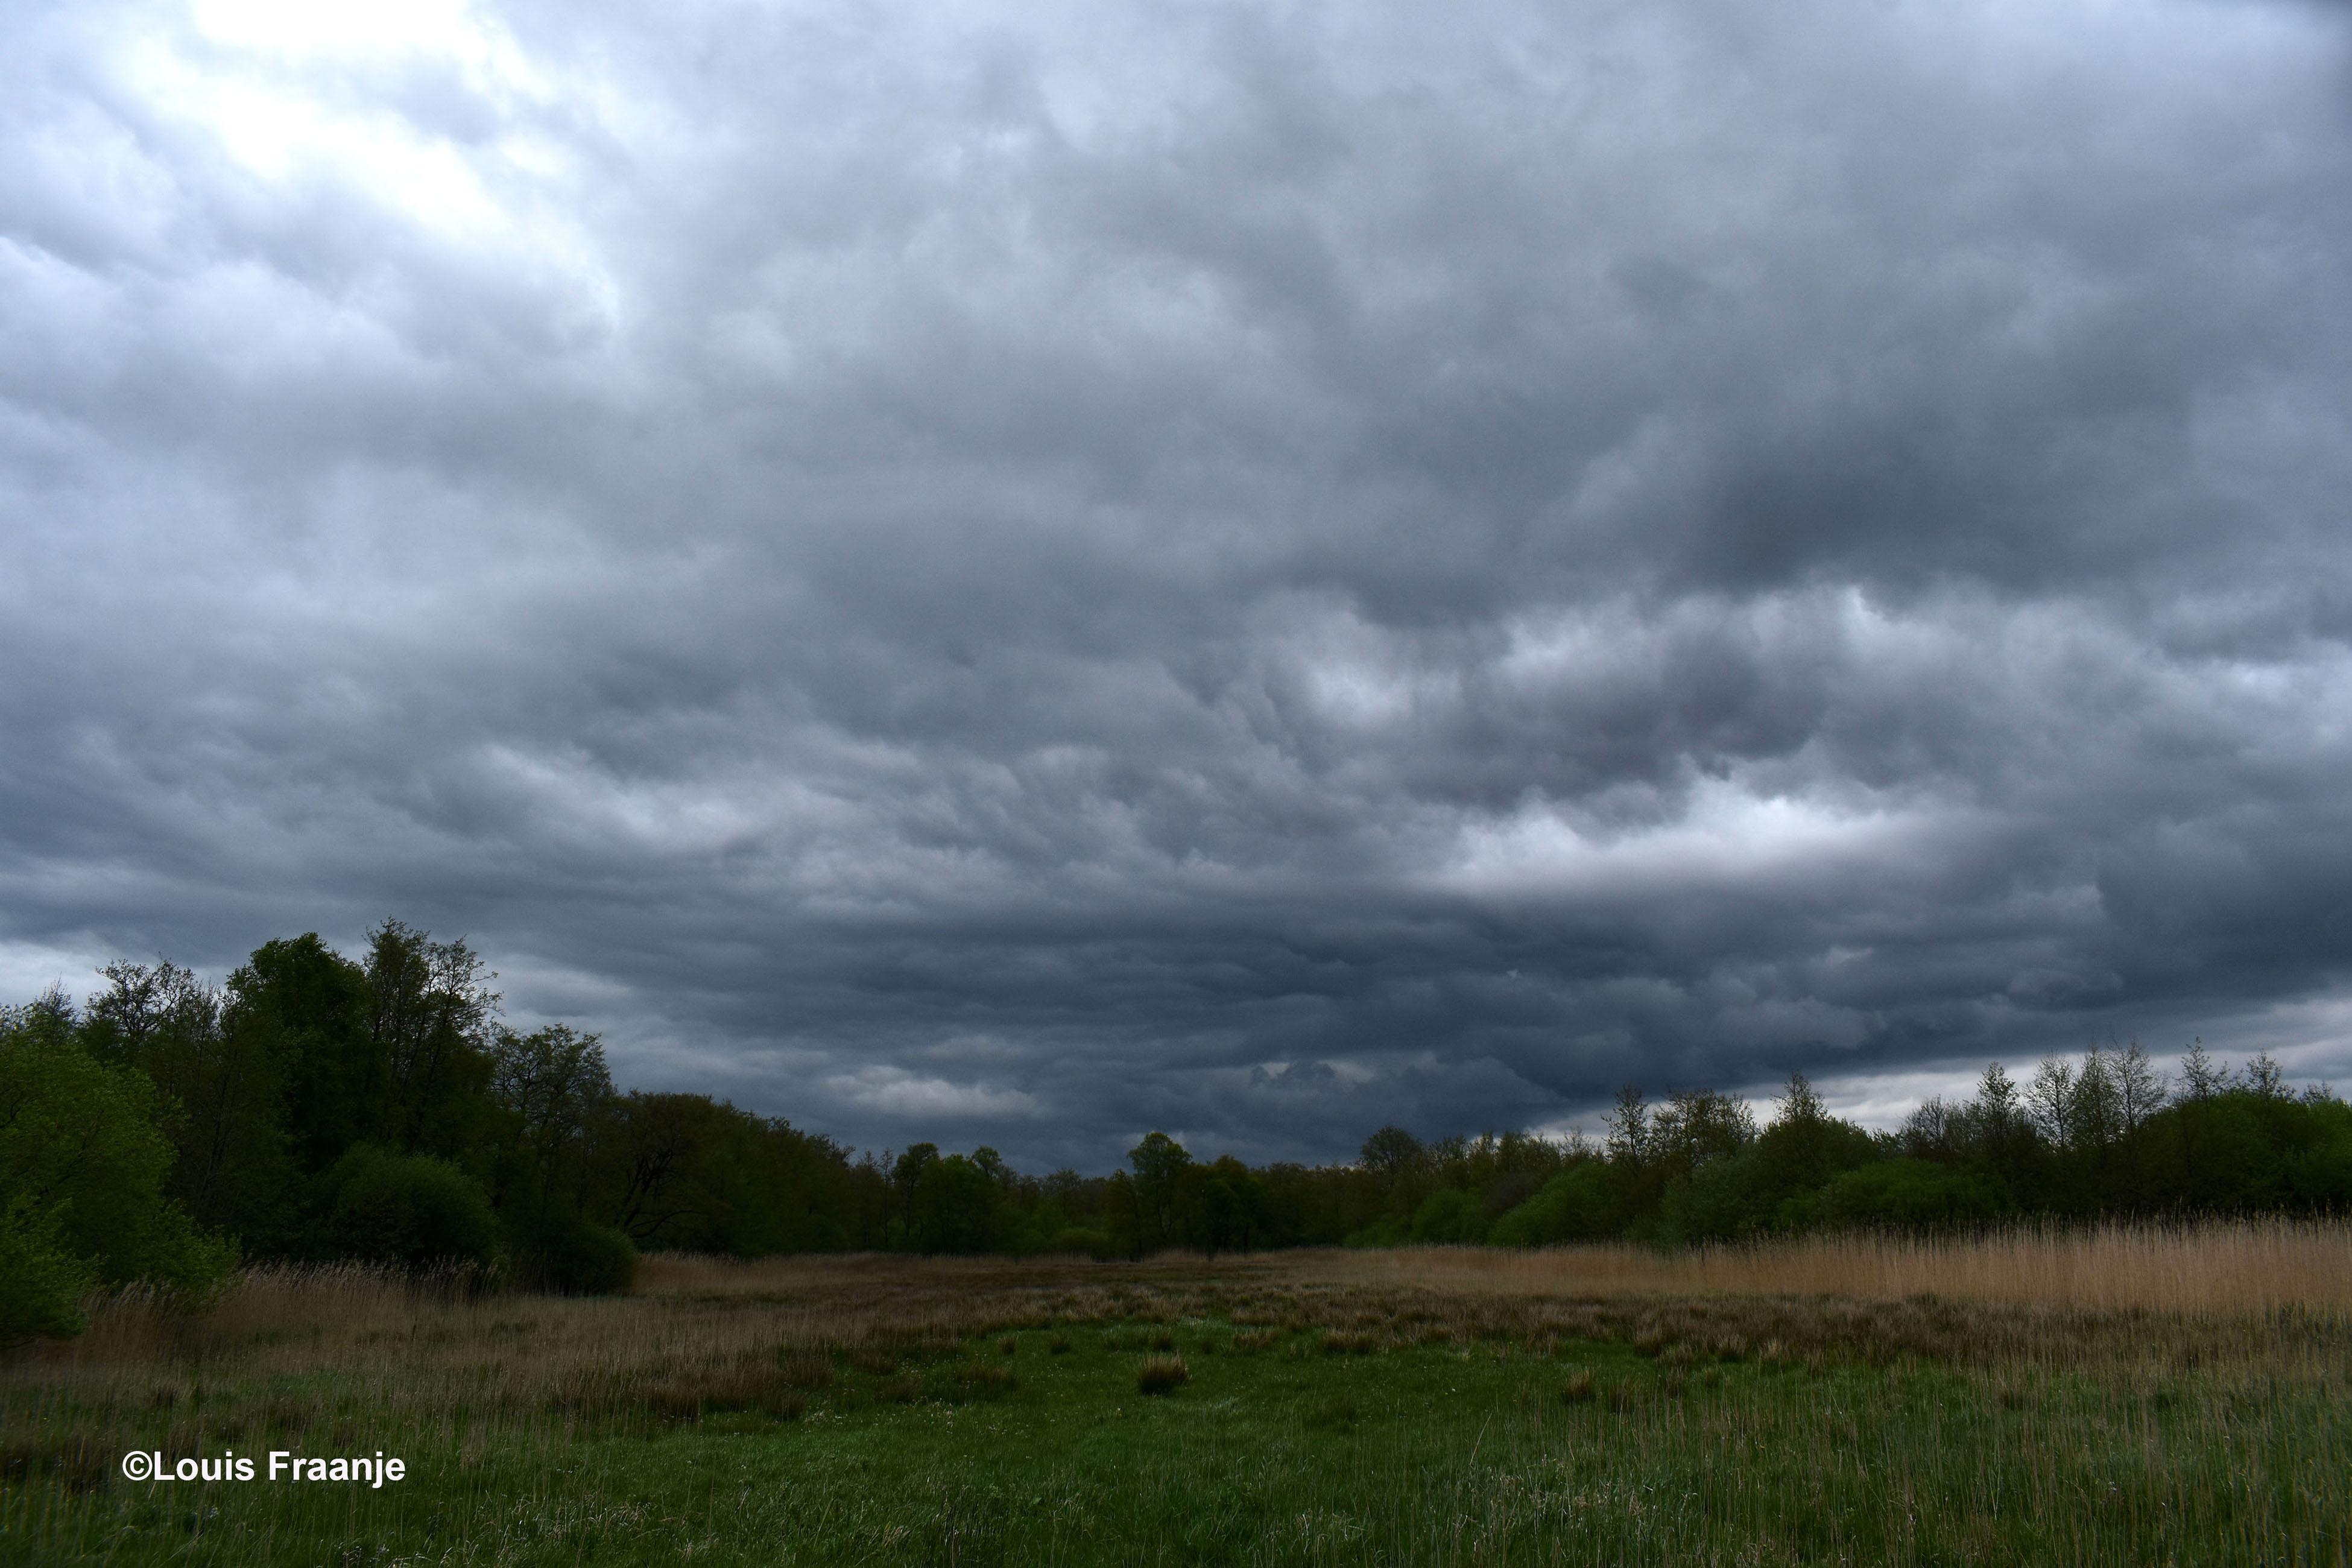 Een donkere en dreigende wolkenlucht 's middags in het Rauwe Veld - Foto: ©Louis Fraanje